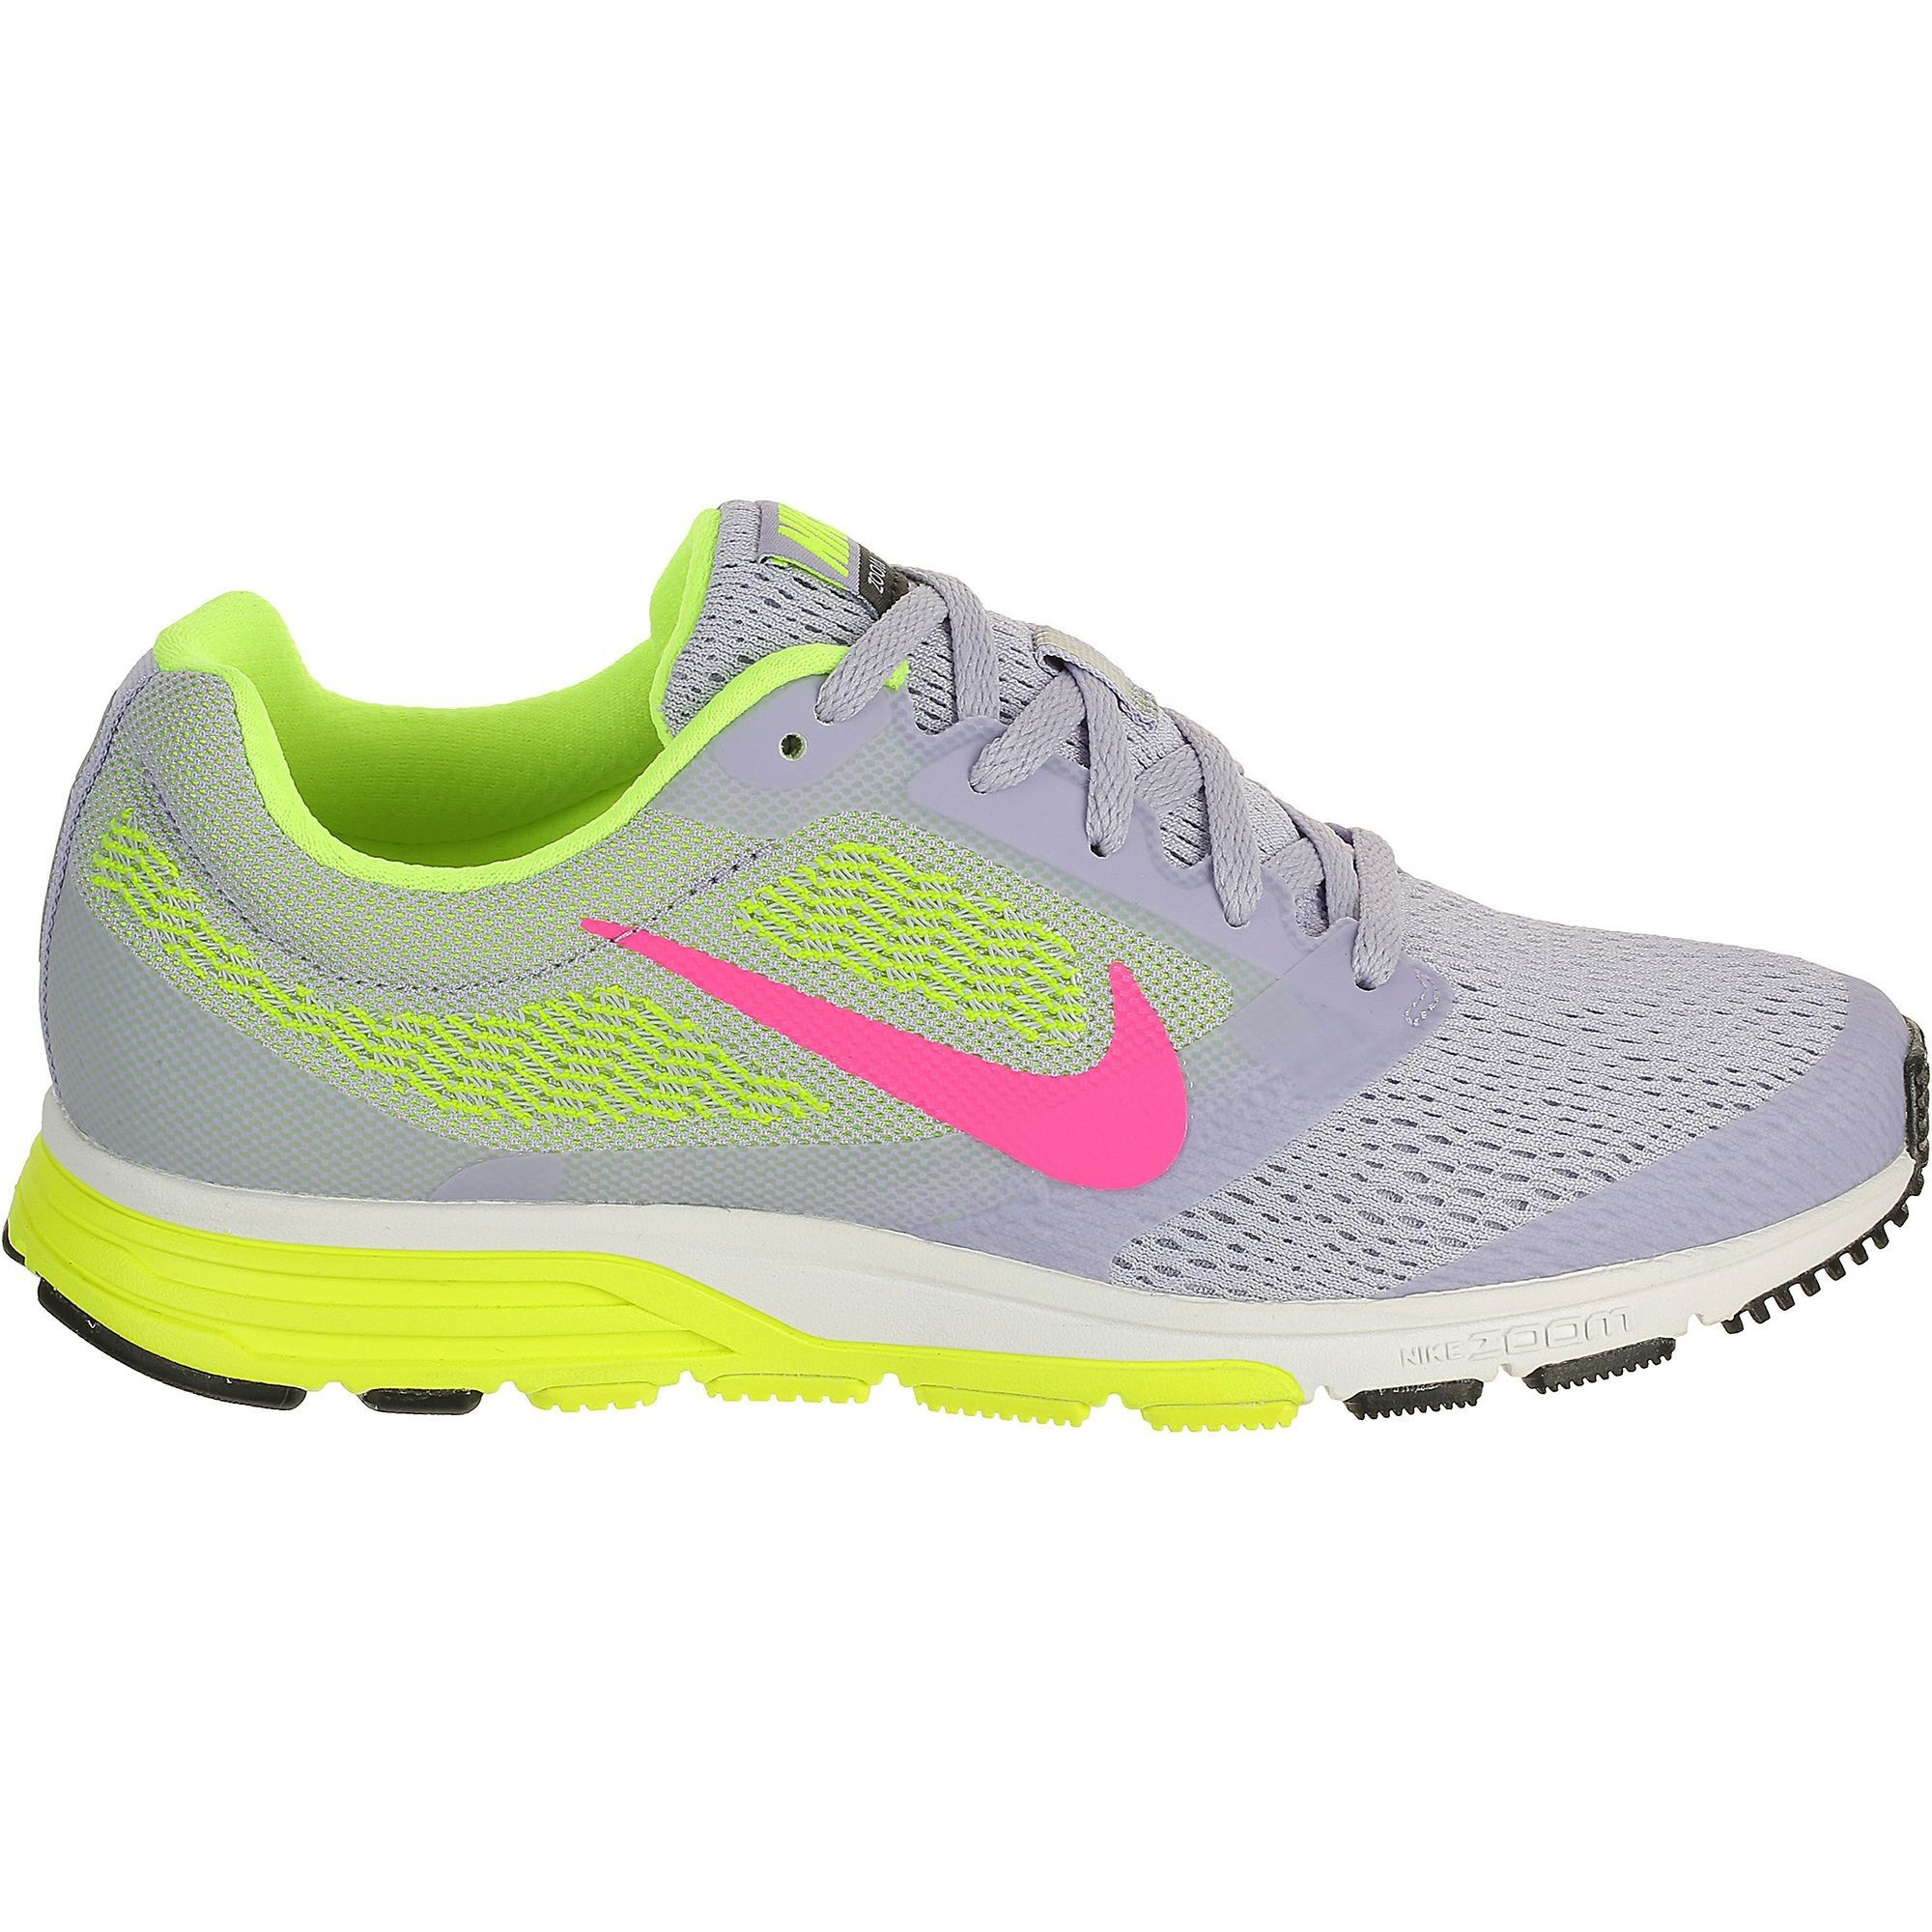 Chaussures de running - NIKE ZOOM FLY GRIS JAUN W PE15 | Chaussure ...